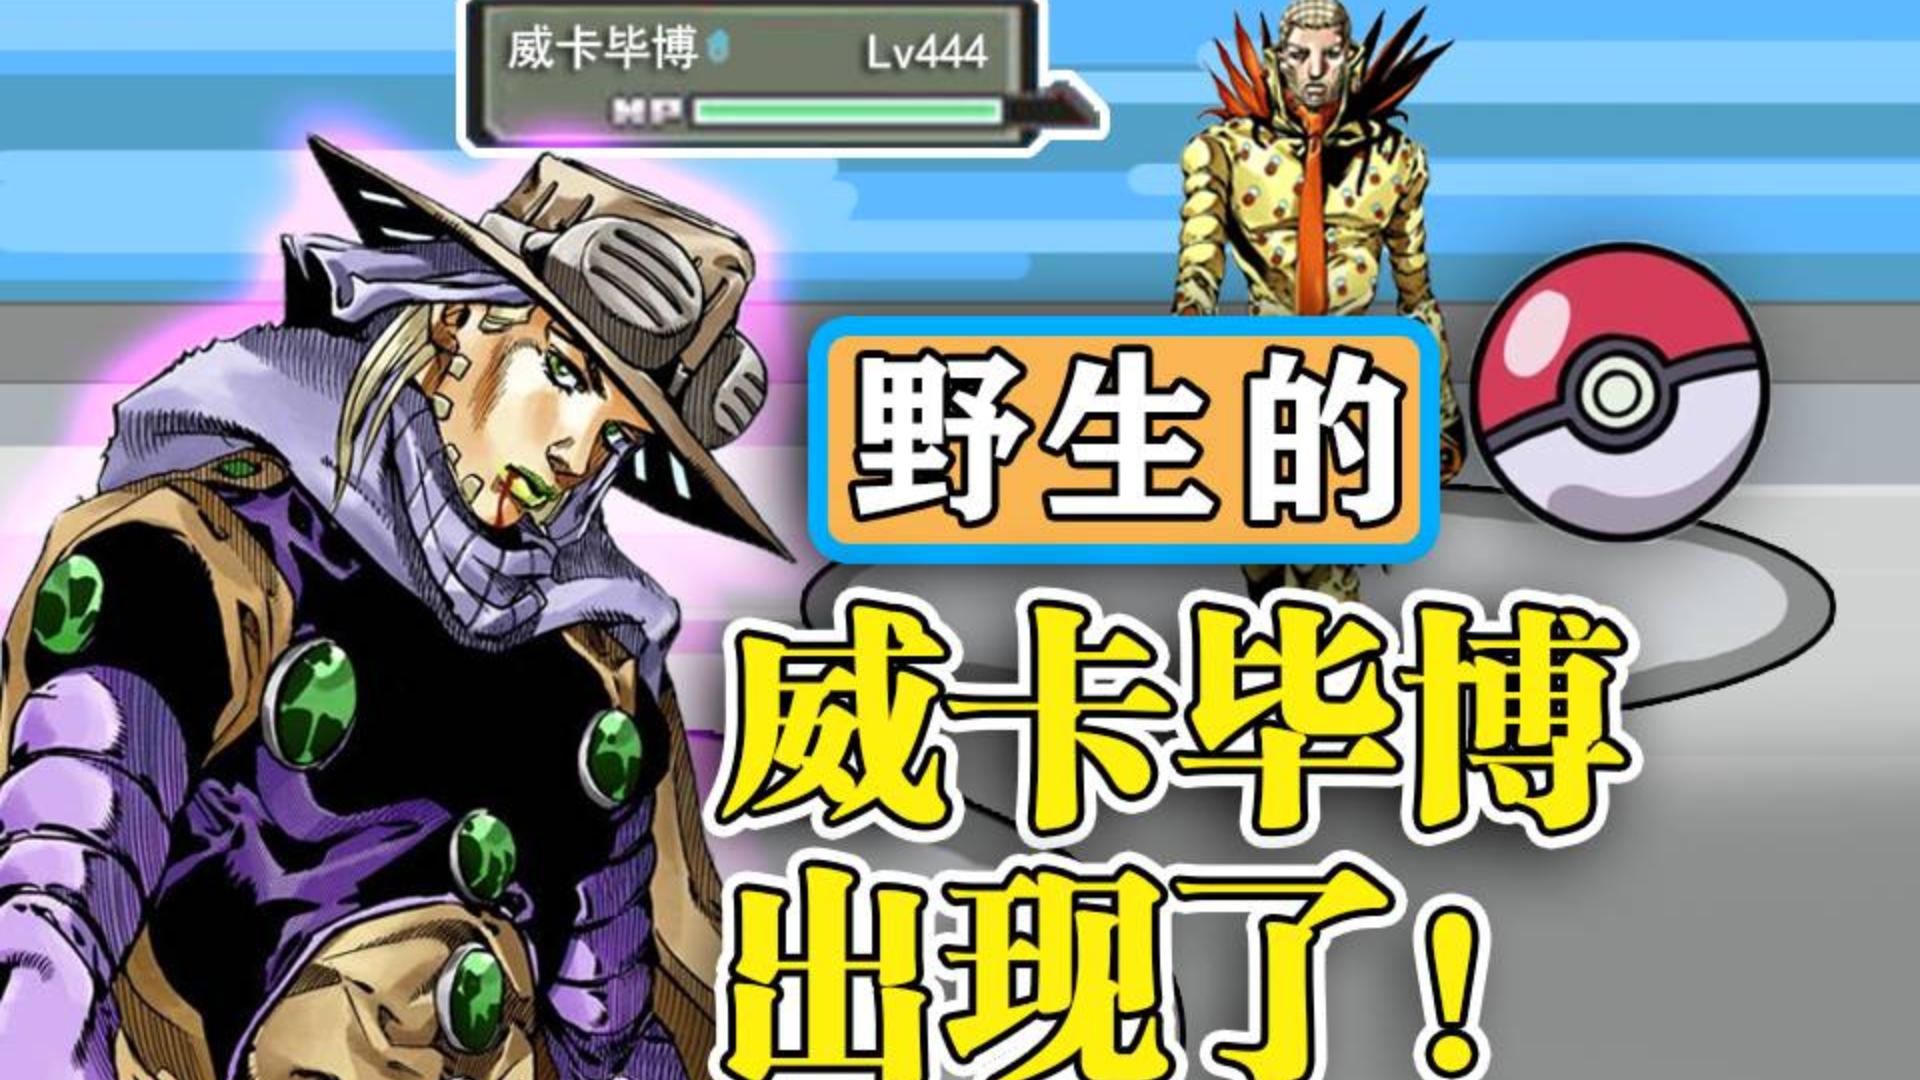 【SBR#44】奇迹?被■■选中的人!复活的黄金矩形! 『JOJO的奇妙冒险 飙马野郎』